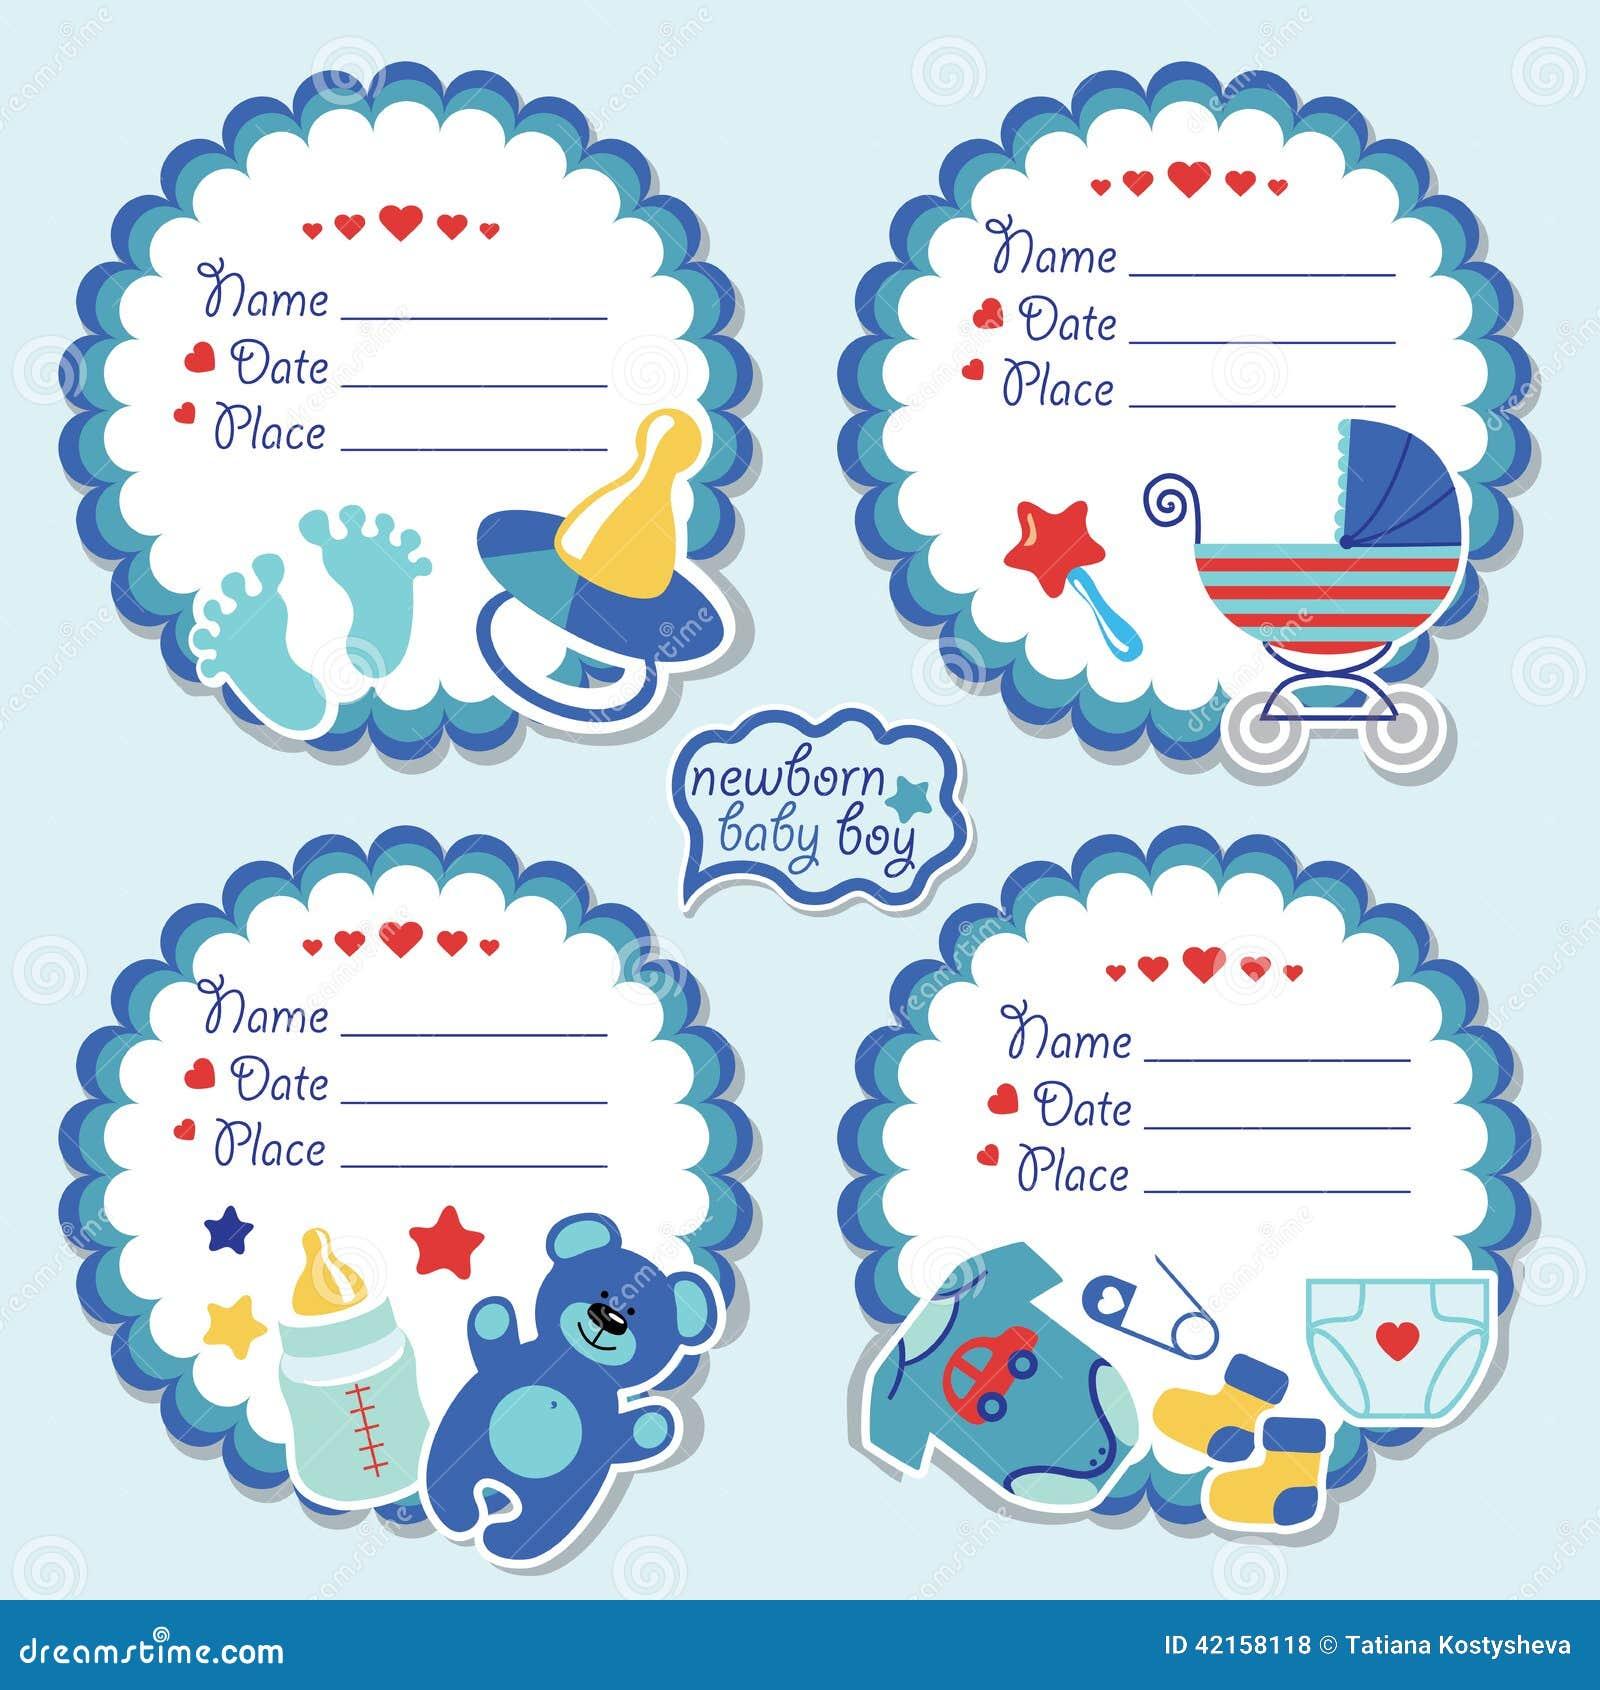 Baby Label Royalty Free Stock Photo - Image: 24432985